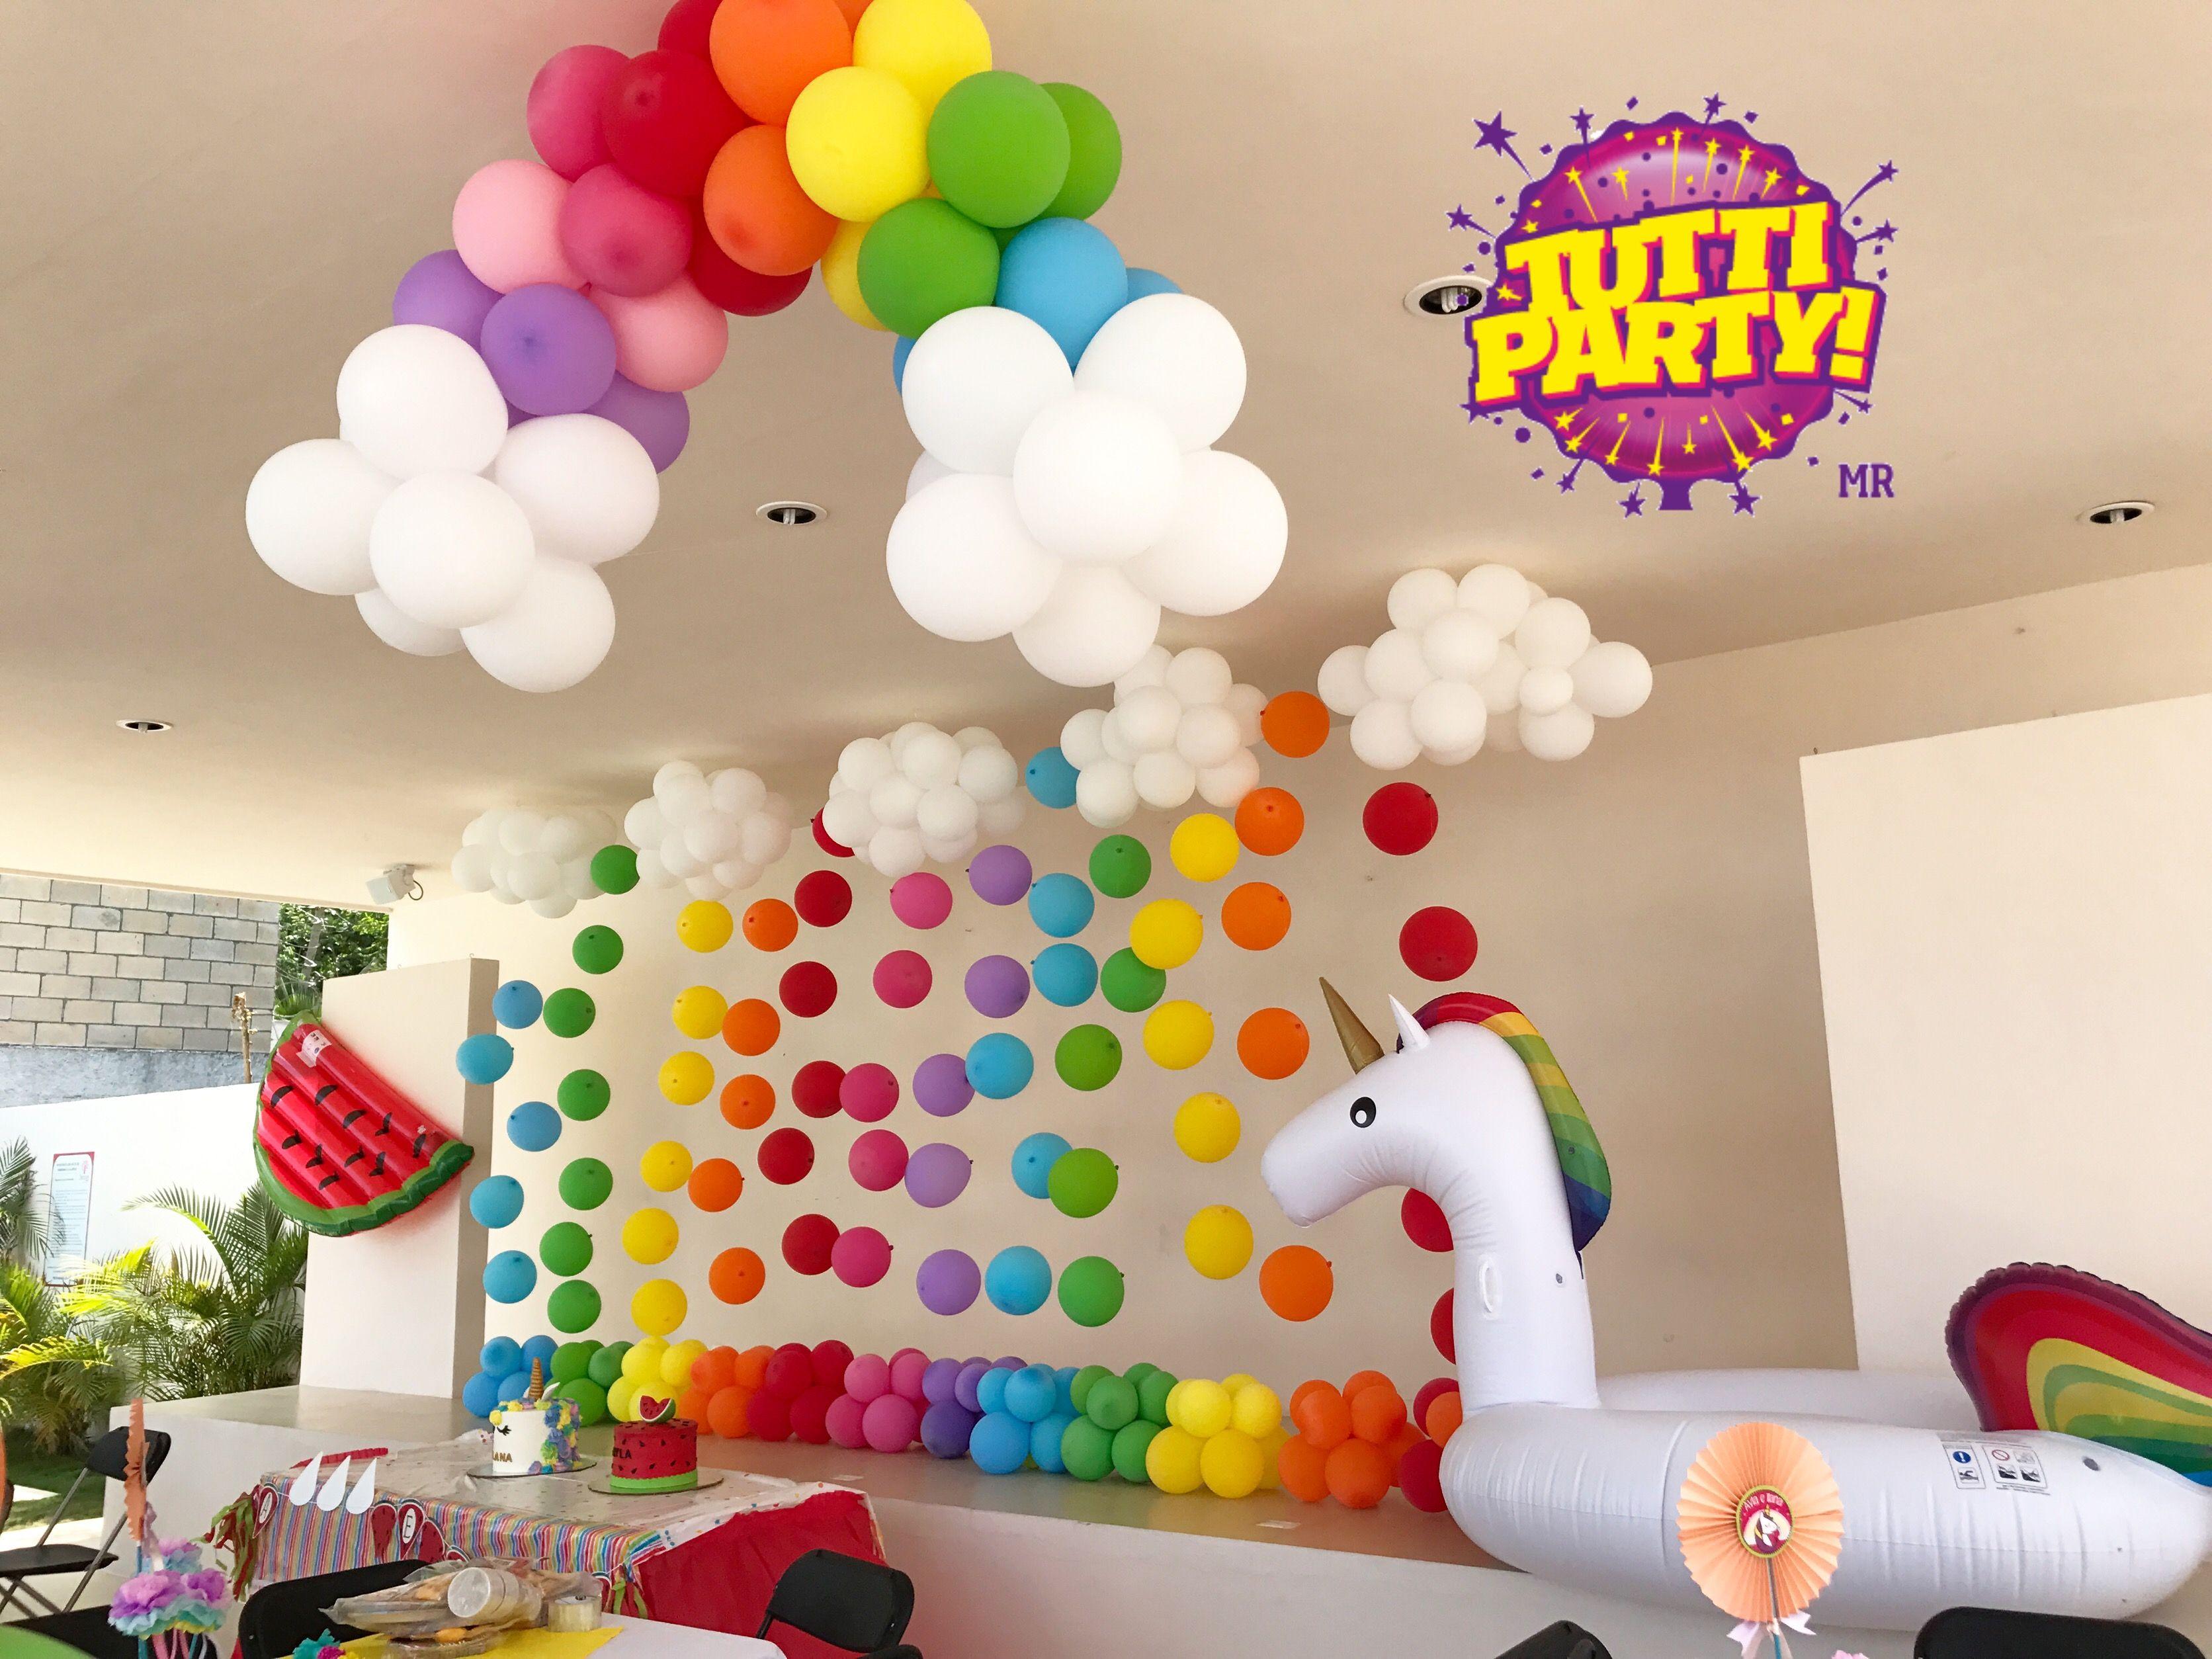 Rainbow party ideas, ventas@tuttiparty.mx unicorn watermelon party